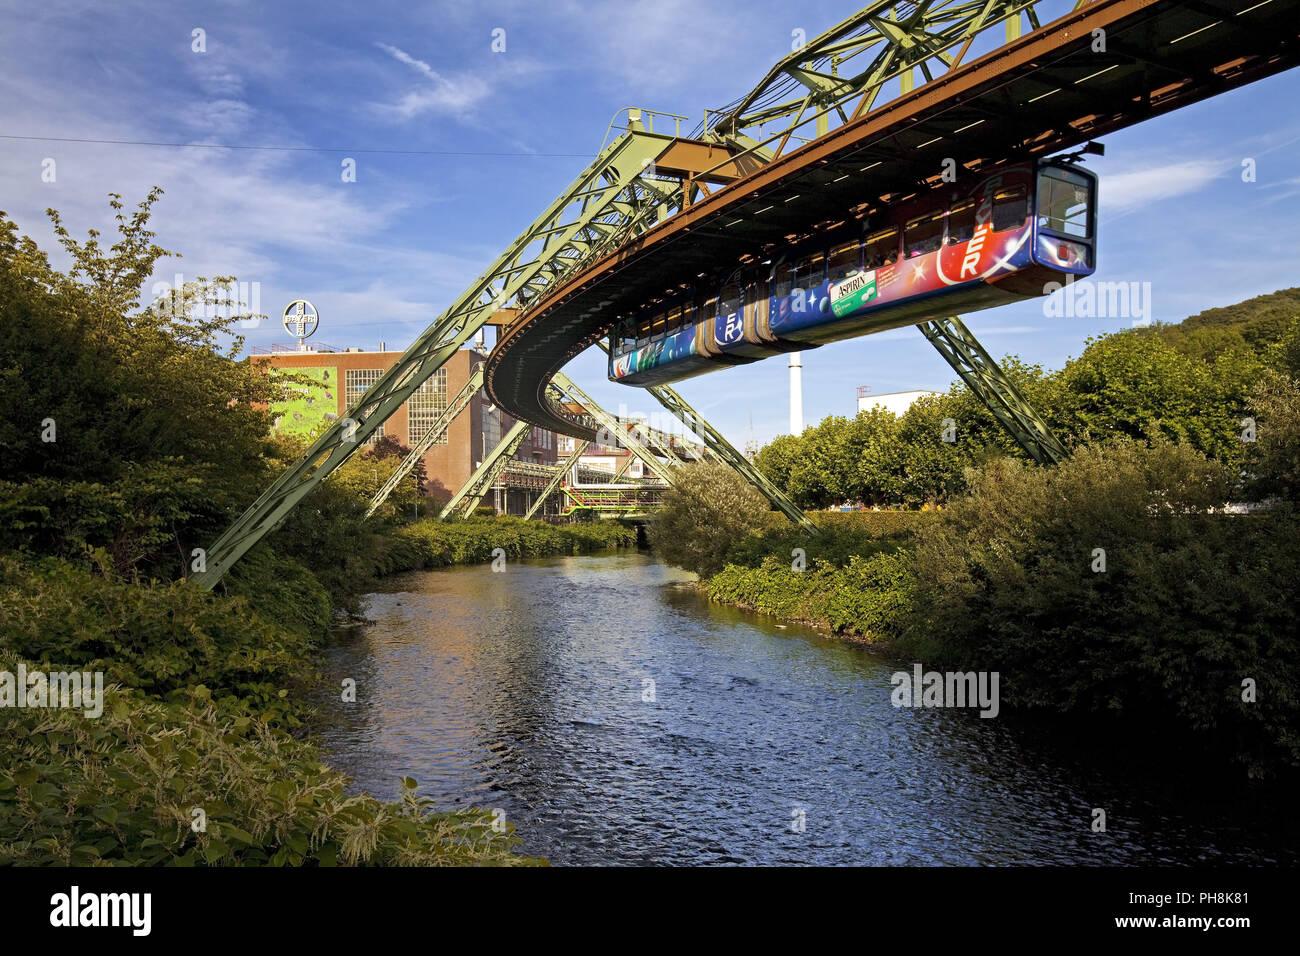 Schwebebahn, suspended monorail, Wuppertal - Stock Image